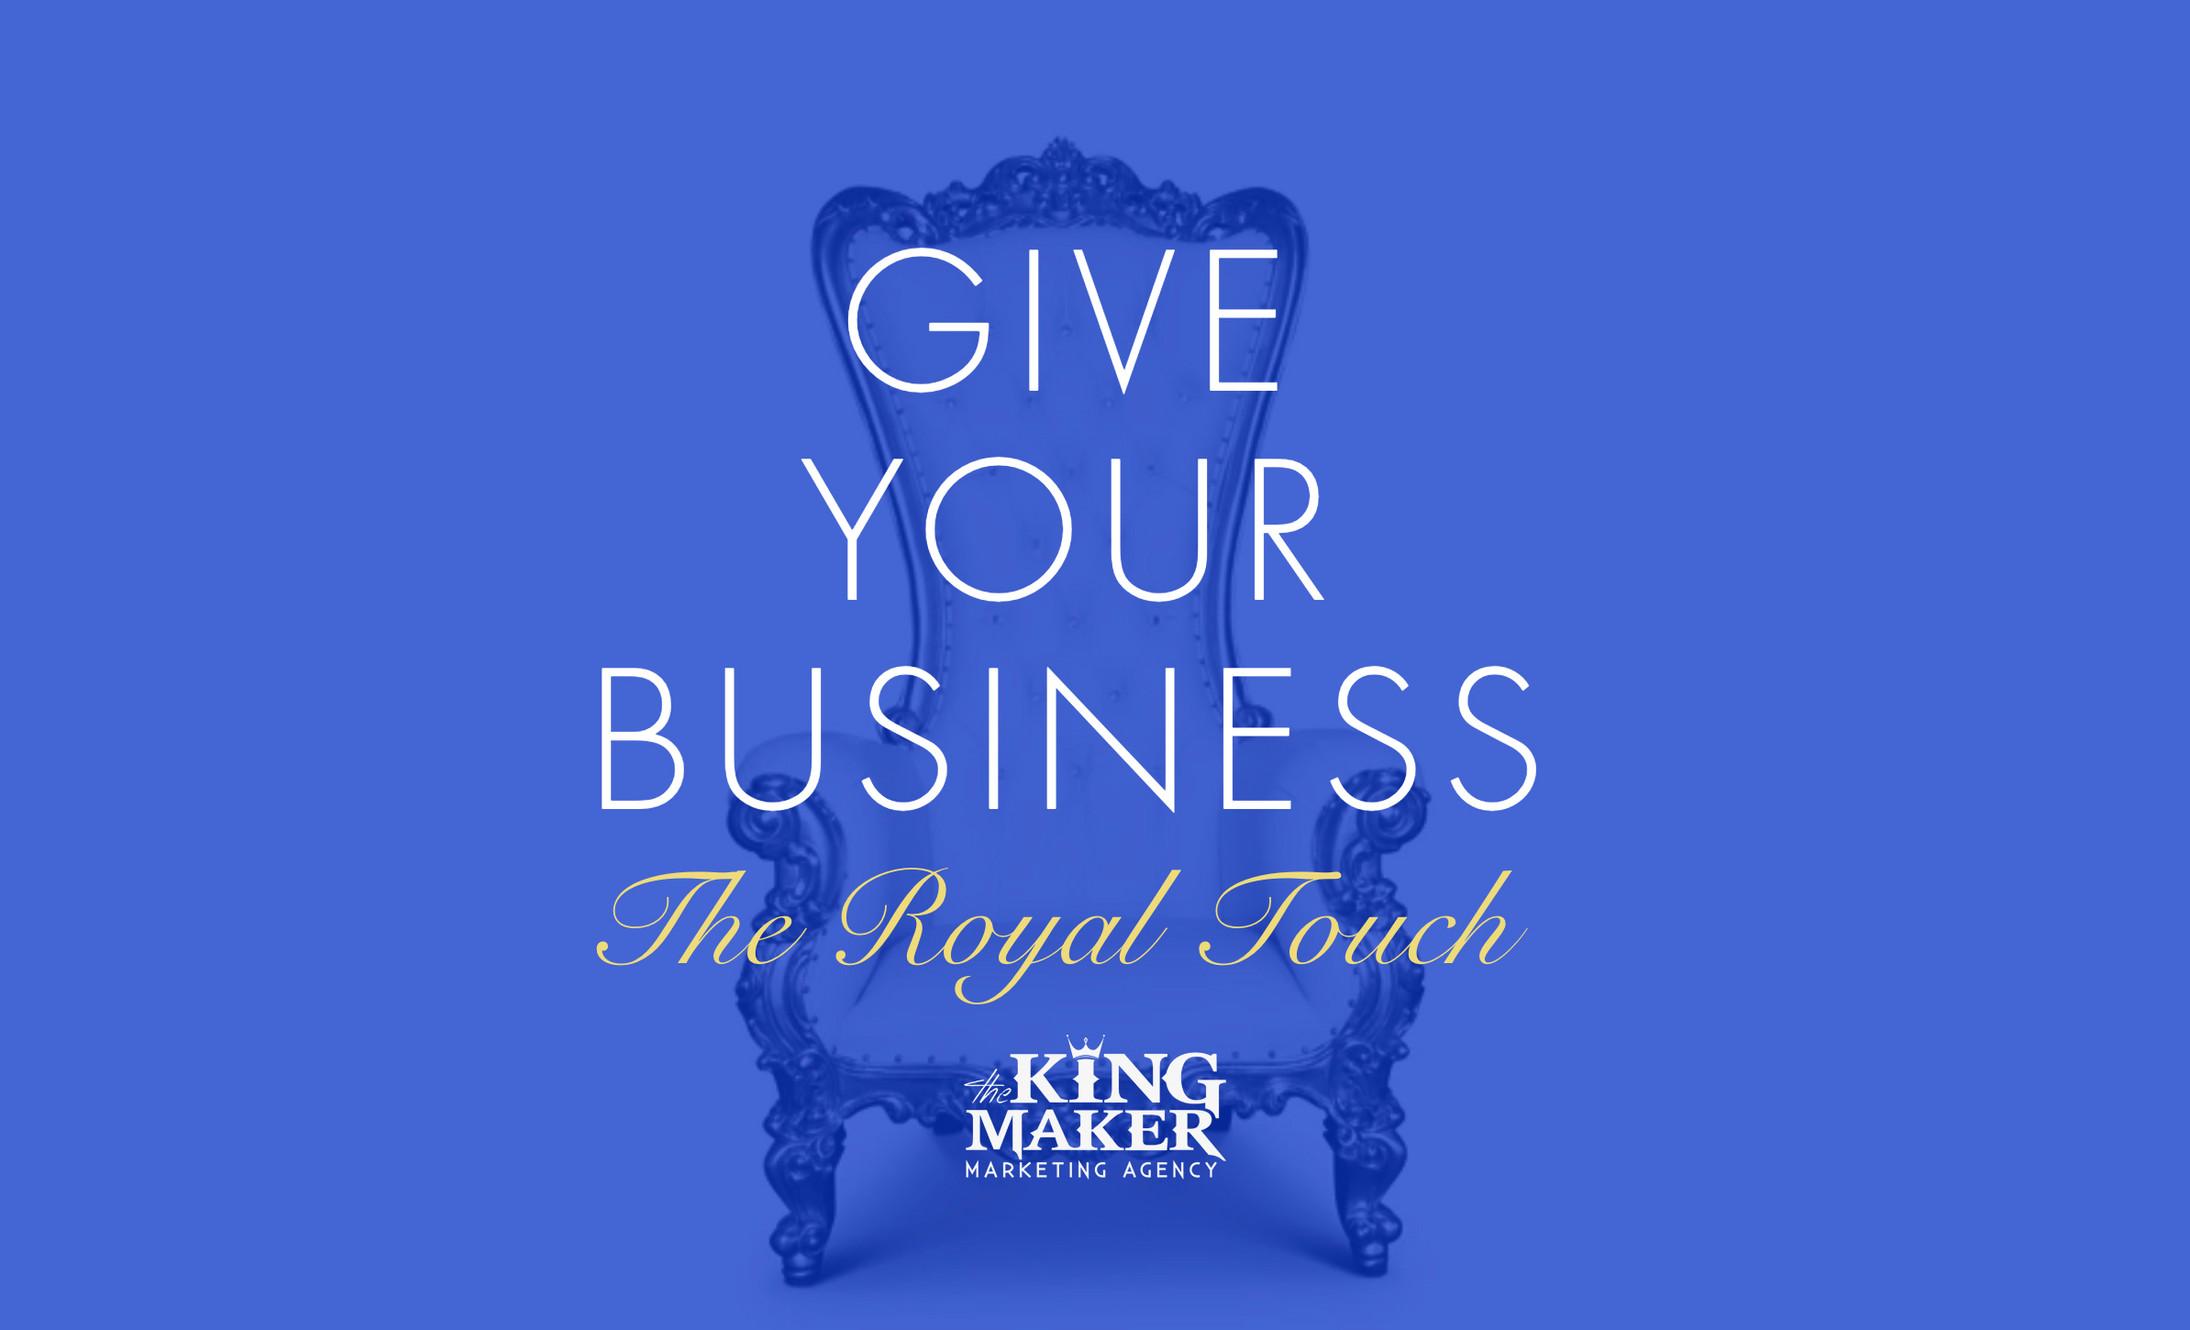 Rudi | Marketing | The KingMaker Marketing Agency | United